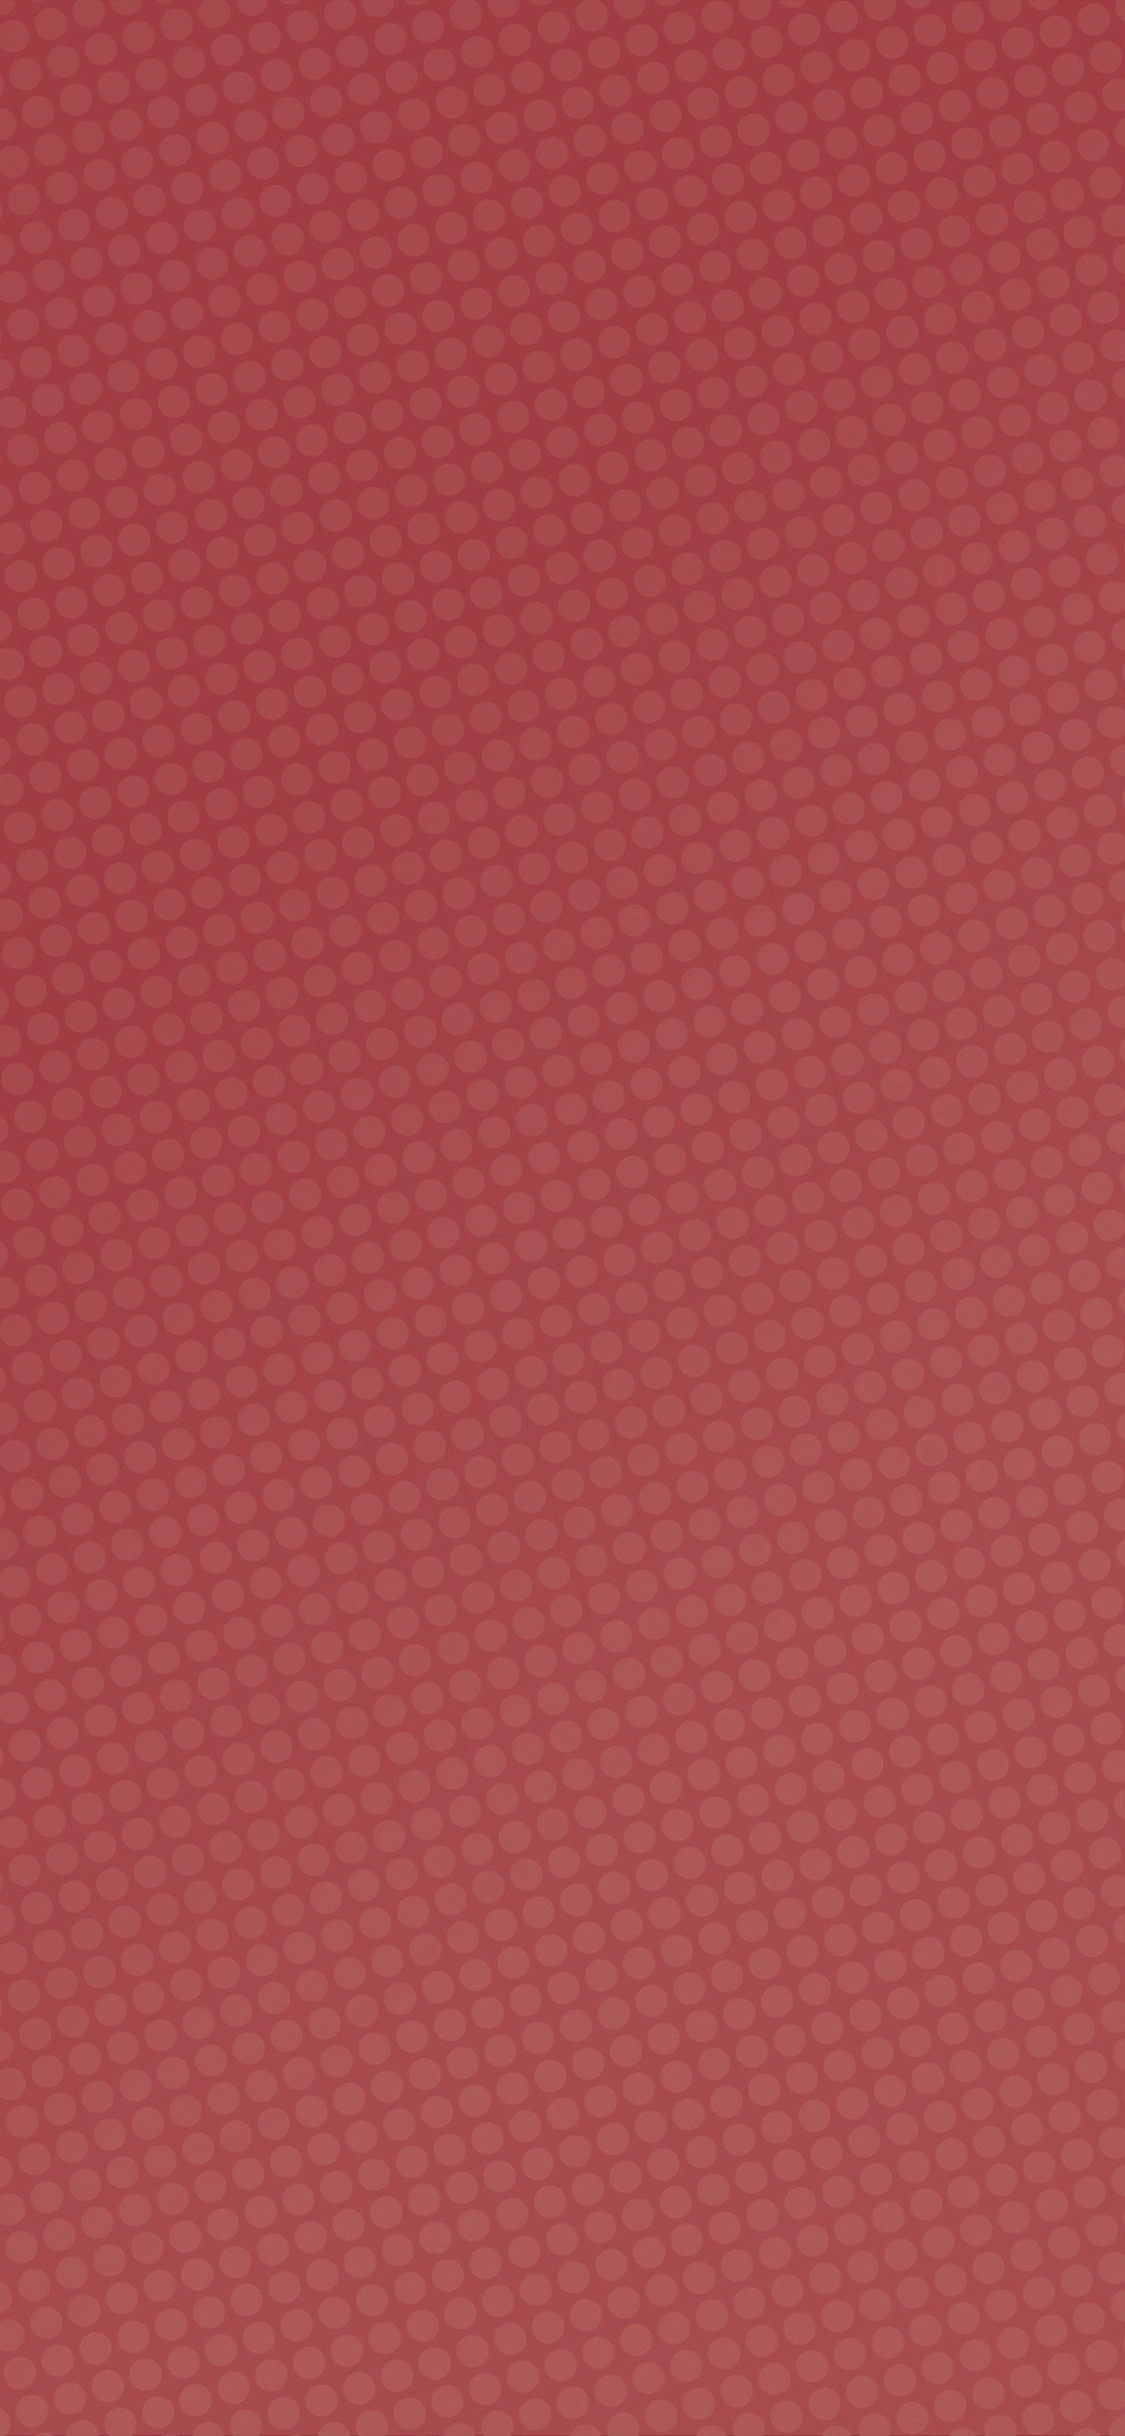 Iphonexpapers Com Apple Iphone Wallpaper Vq50 Dots Red